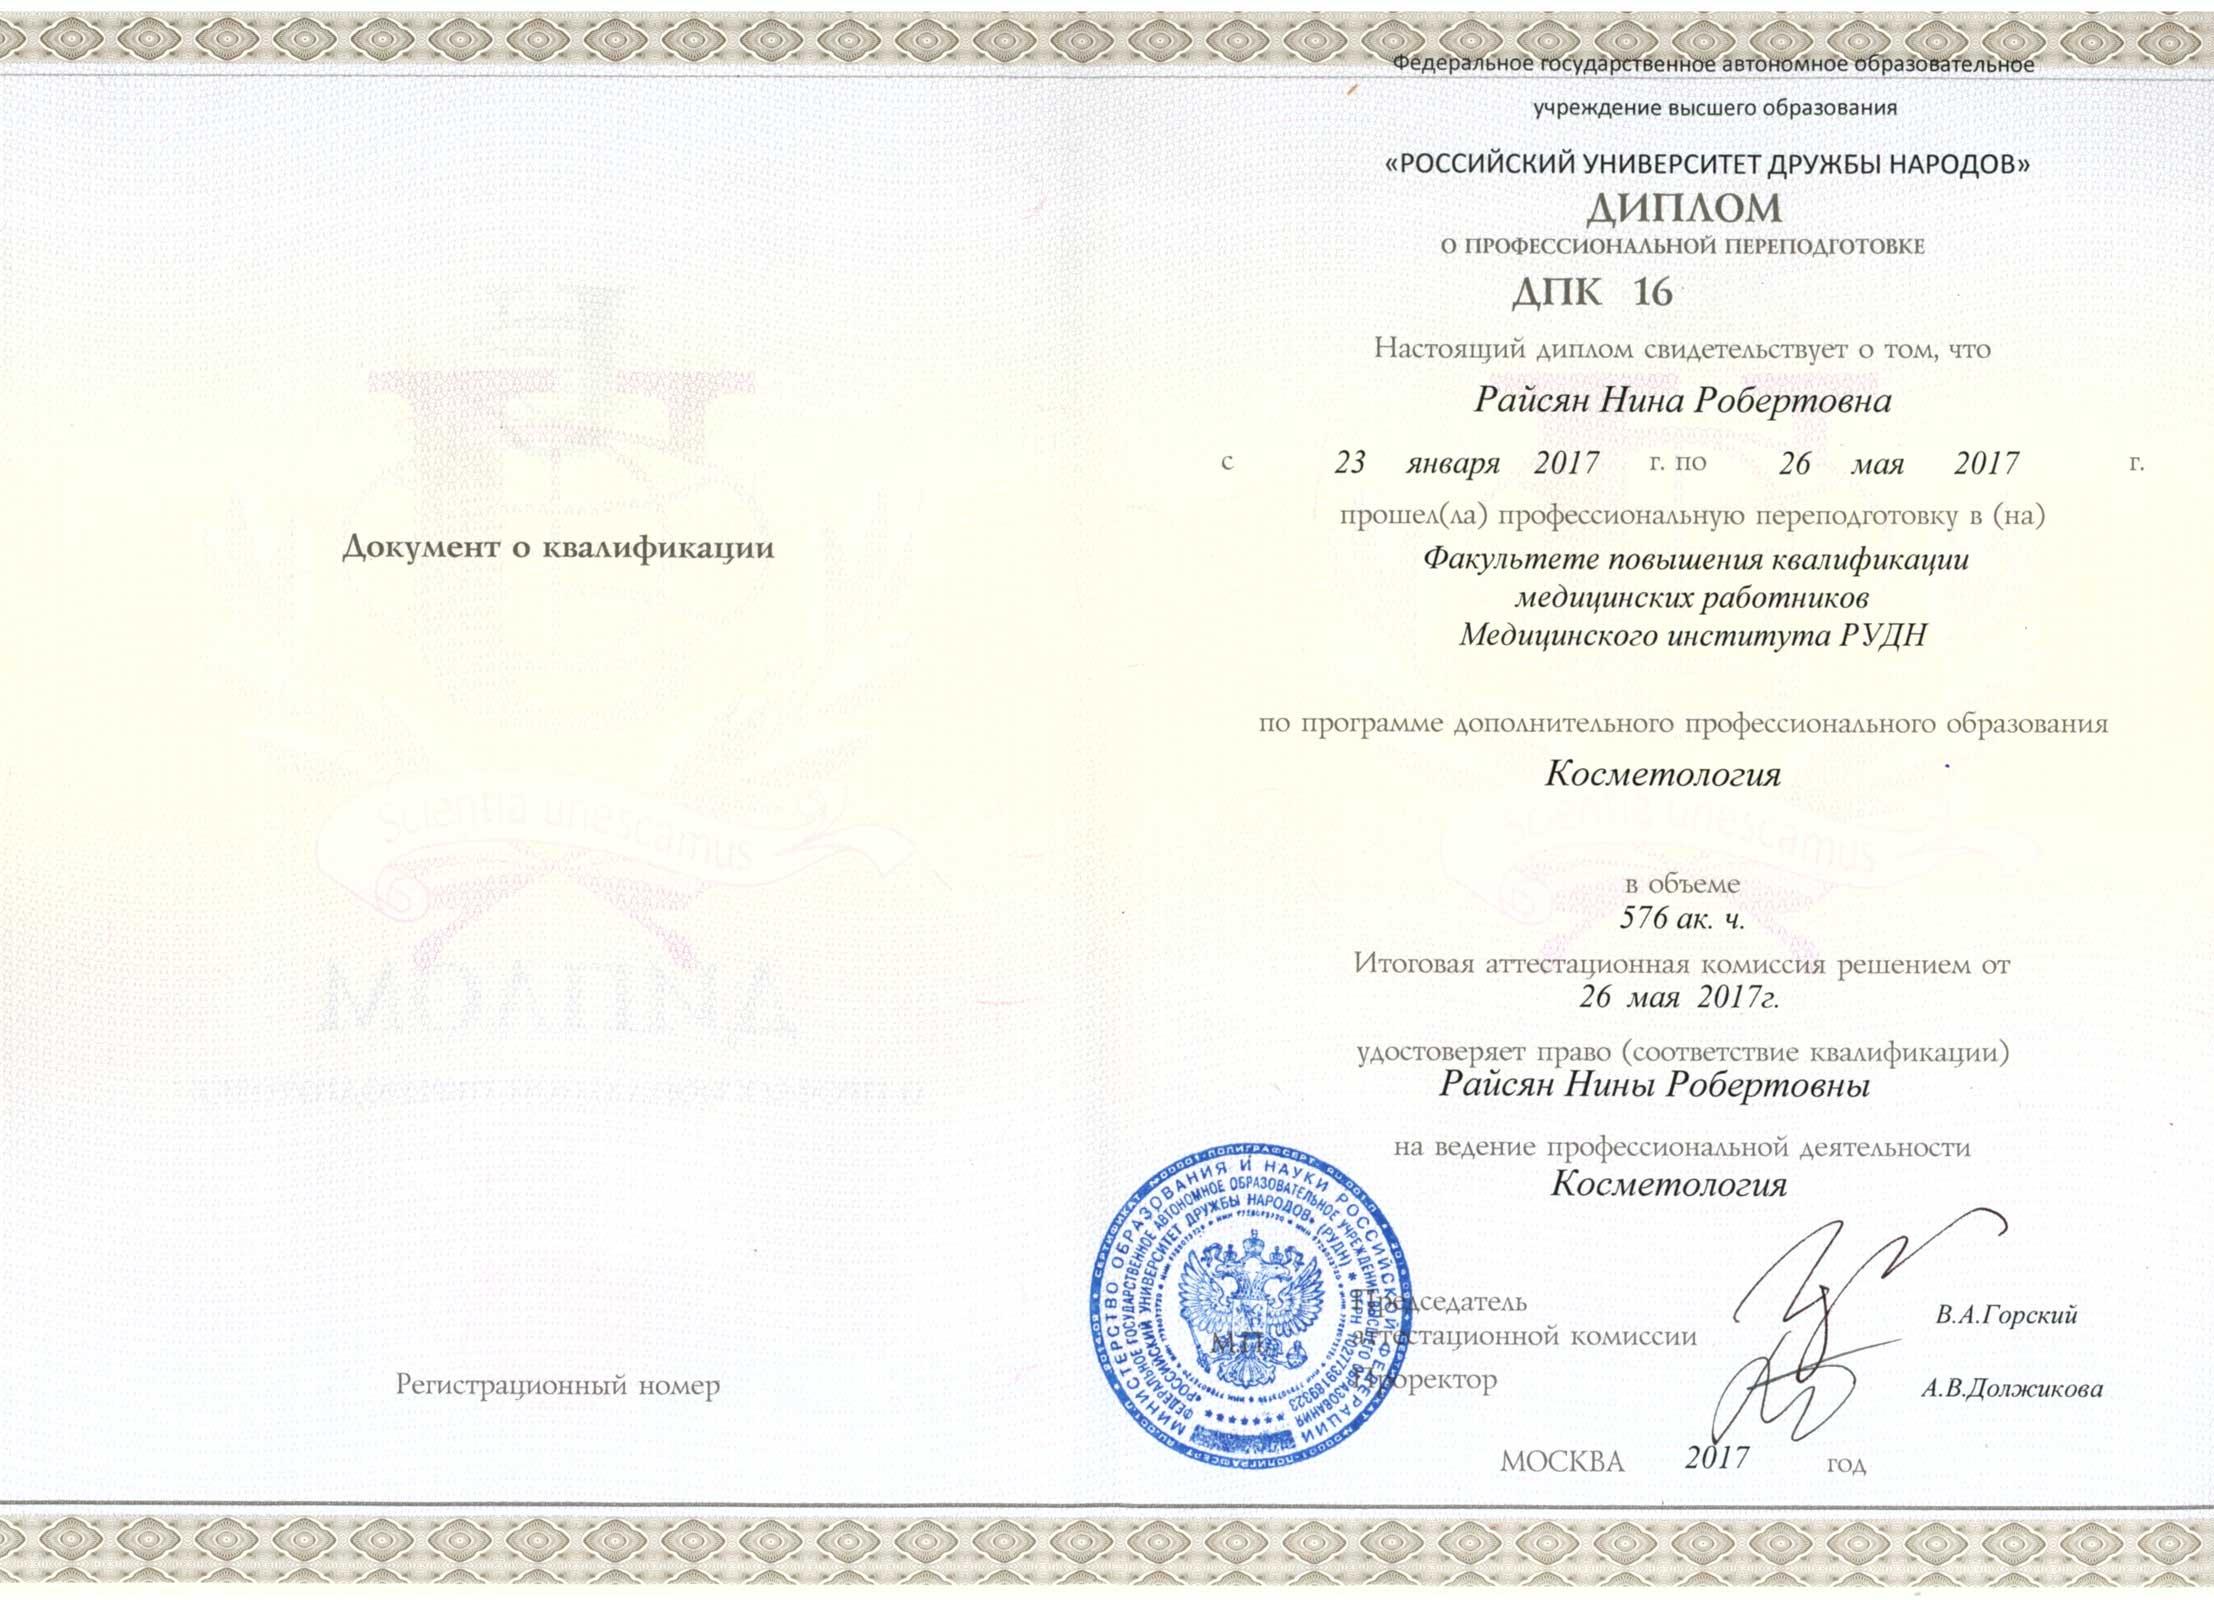 Диплом косметолога Райсян Н.Р